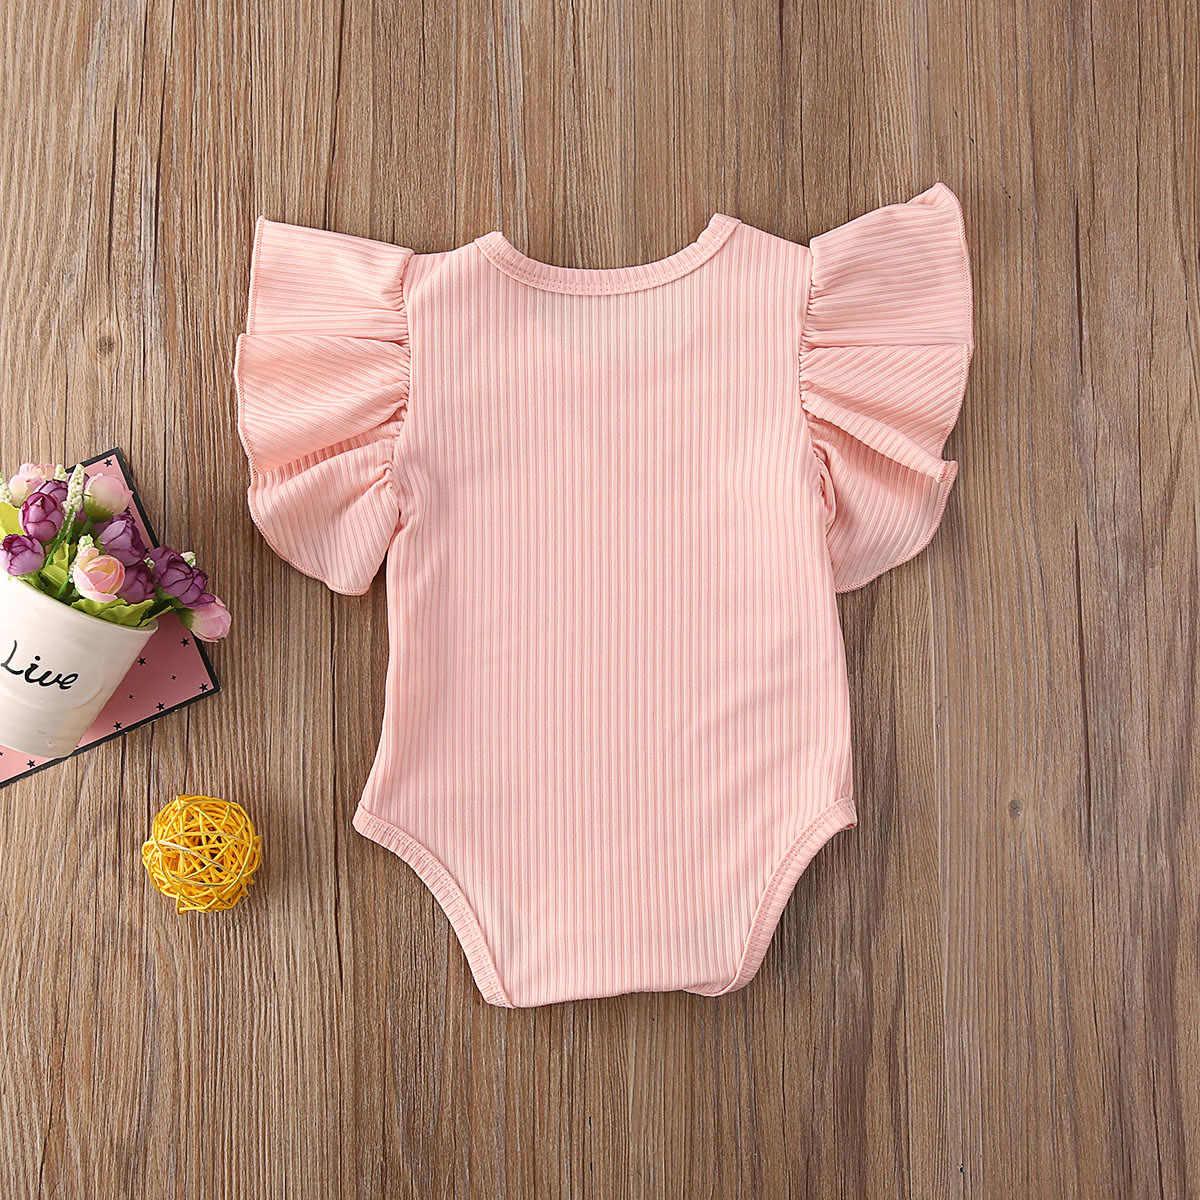 Cute Summer Newborn Baby Bodysuits Cotton Knit Infant Kids Solid Fly Sleeve Jumpsuits Princess Sweet Bodysuits Sunsuit 0-18M